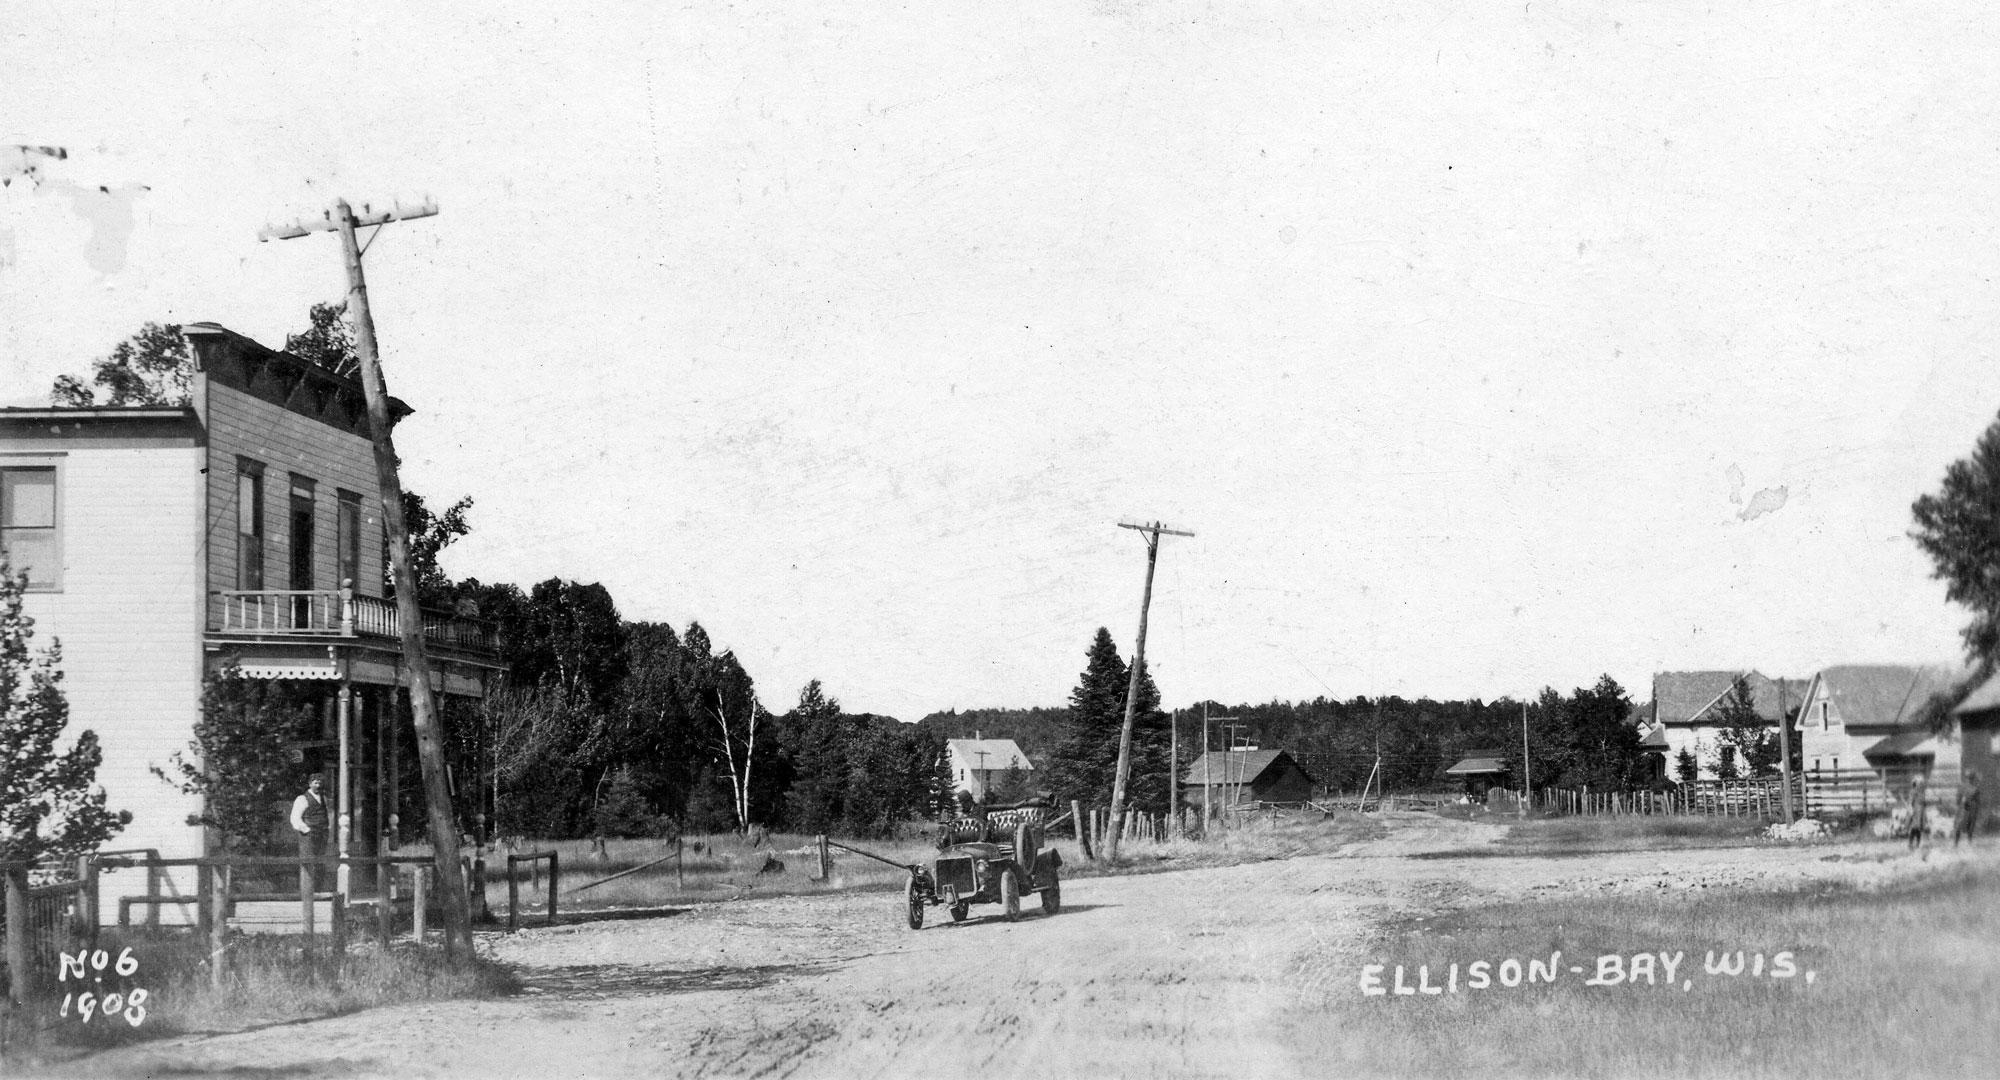 Ruckert's in Ellison Bay, 1908